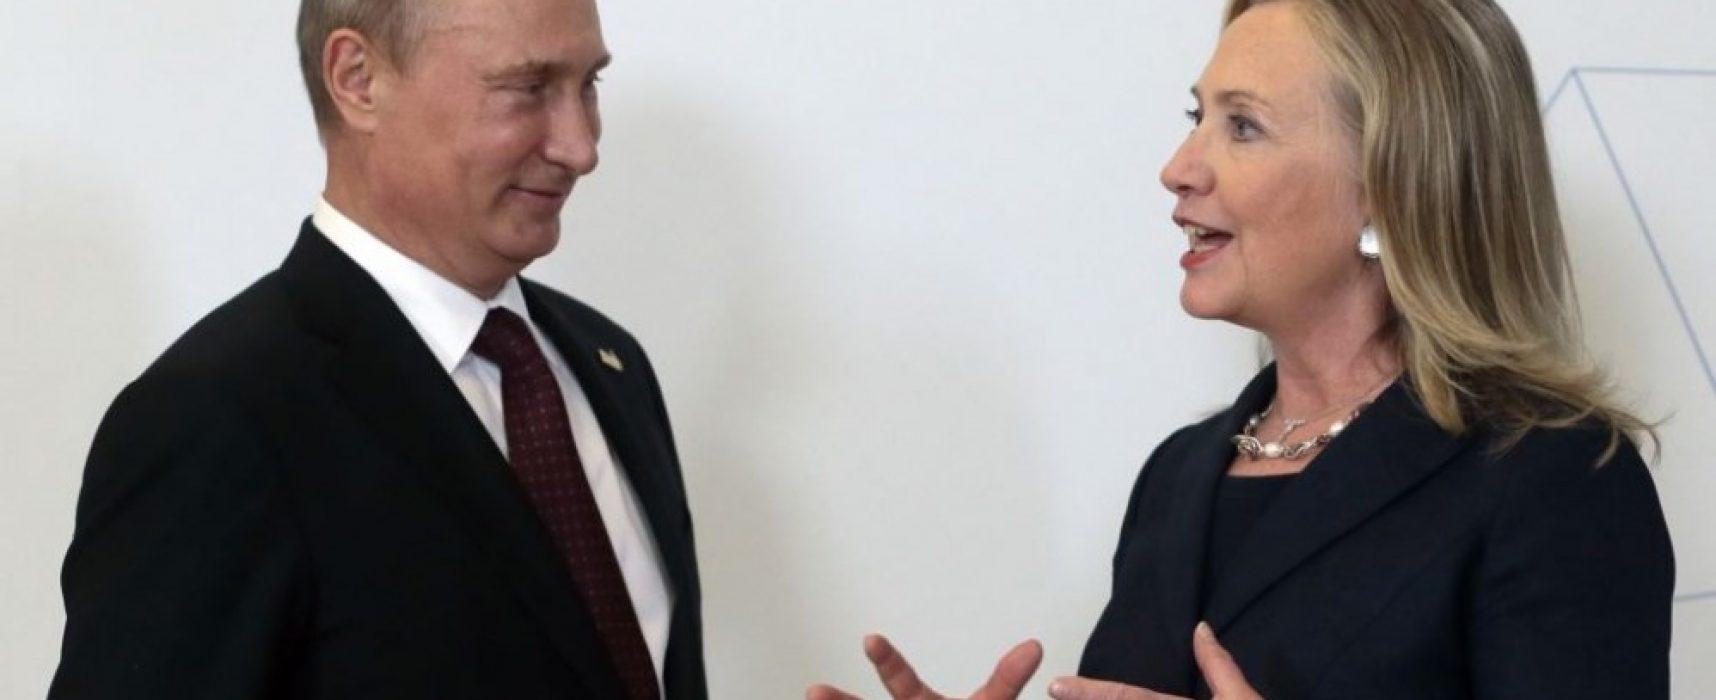 Russia's Cyber Warfare Has Bigger Aims Than Electing Donald Trump